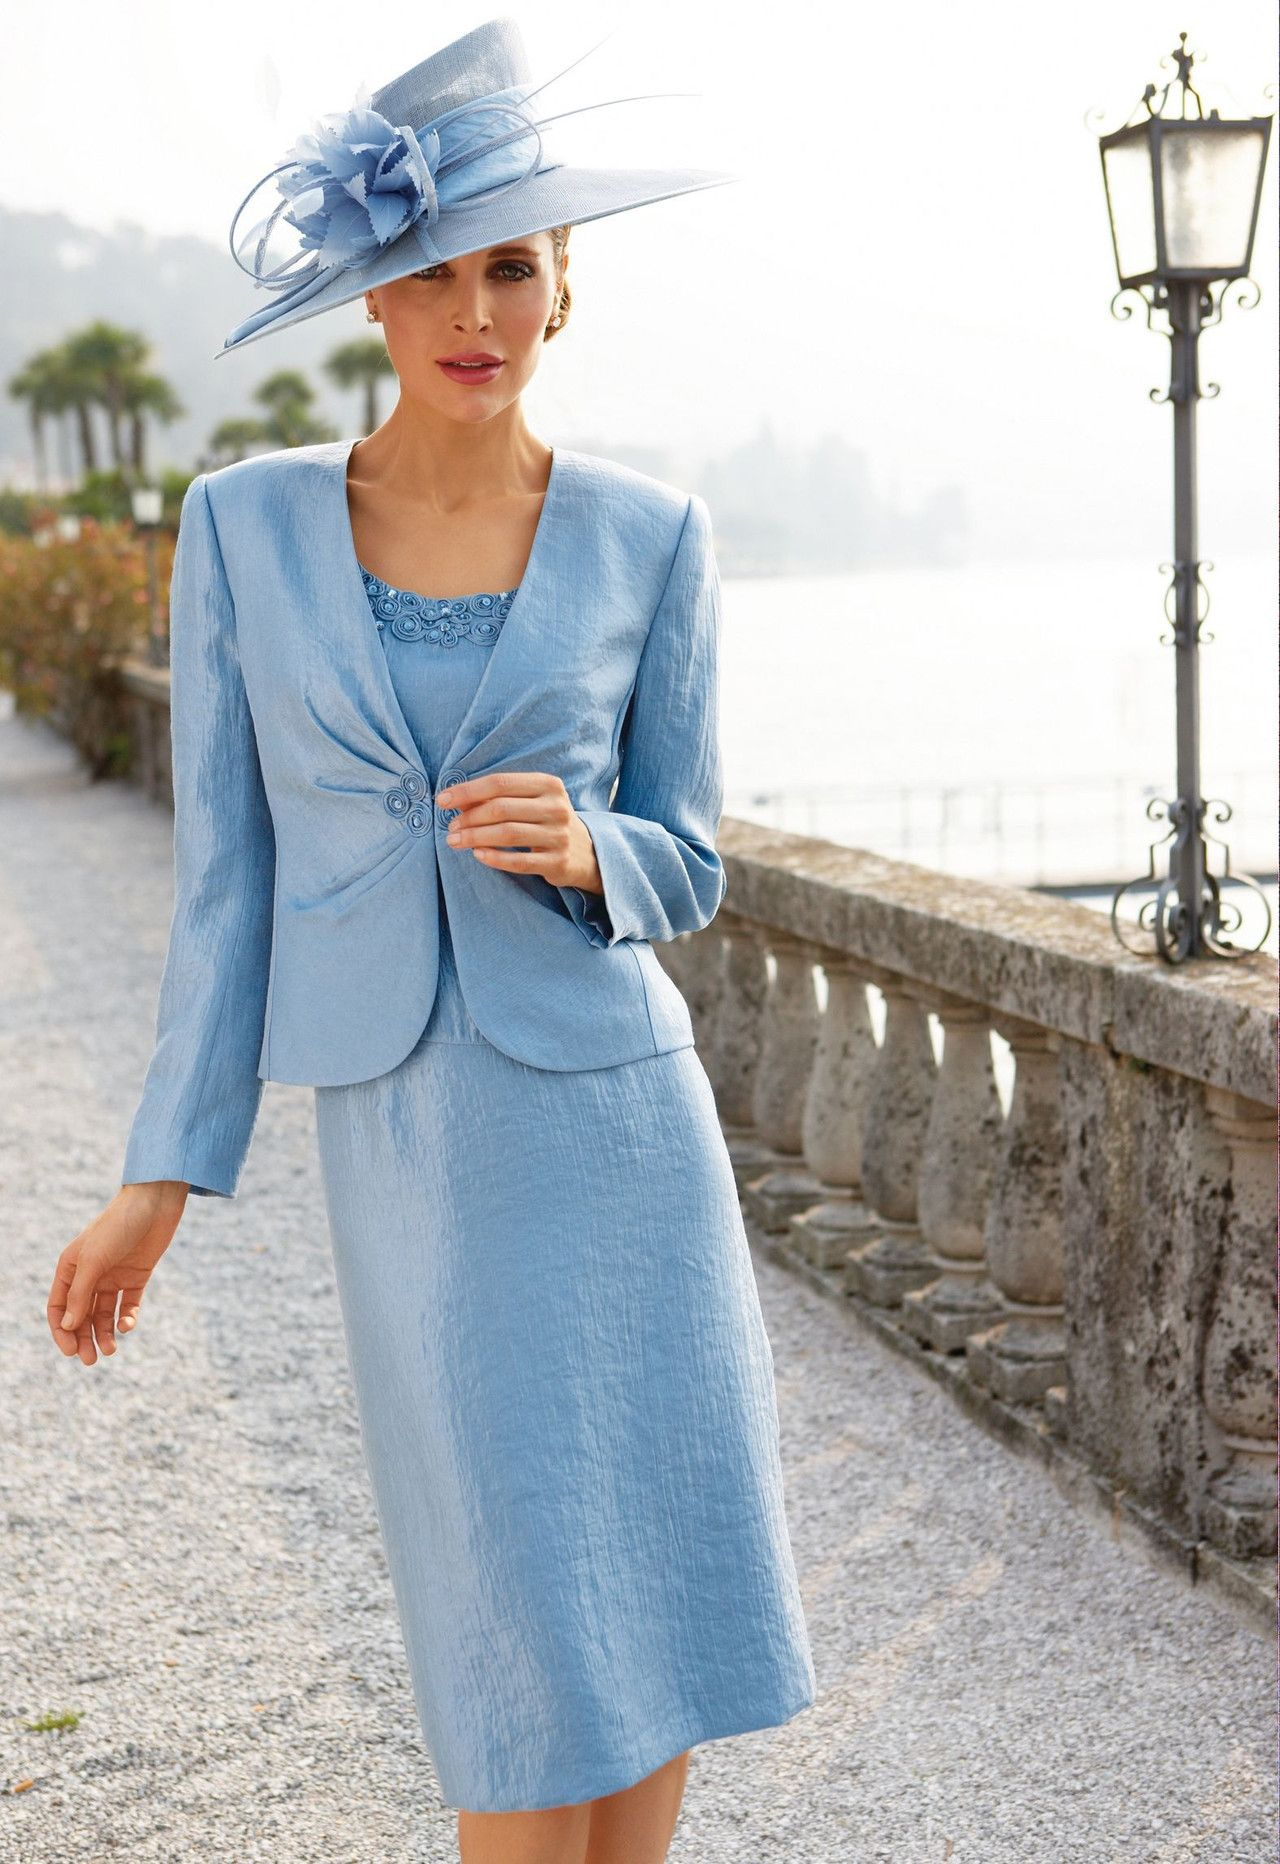 Skirt suits, uniforms, amazing dresses... | My Style | Pinterest ...